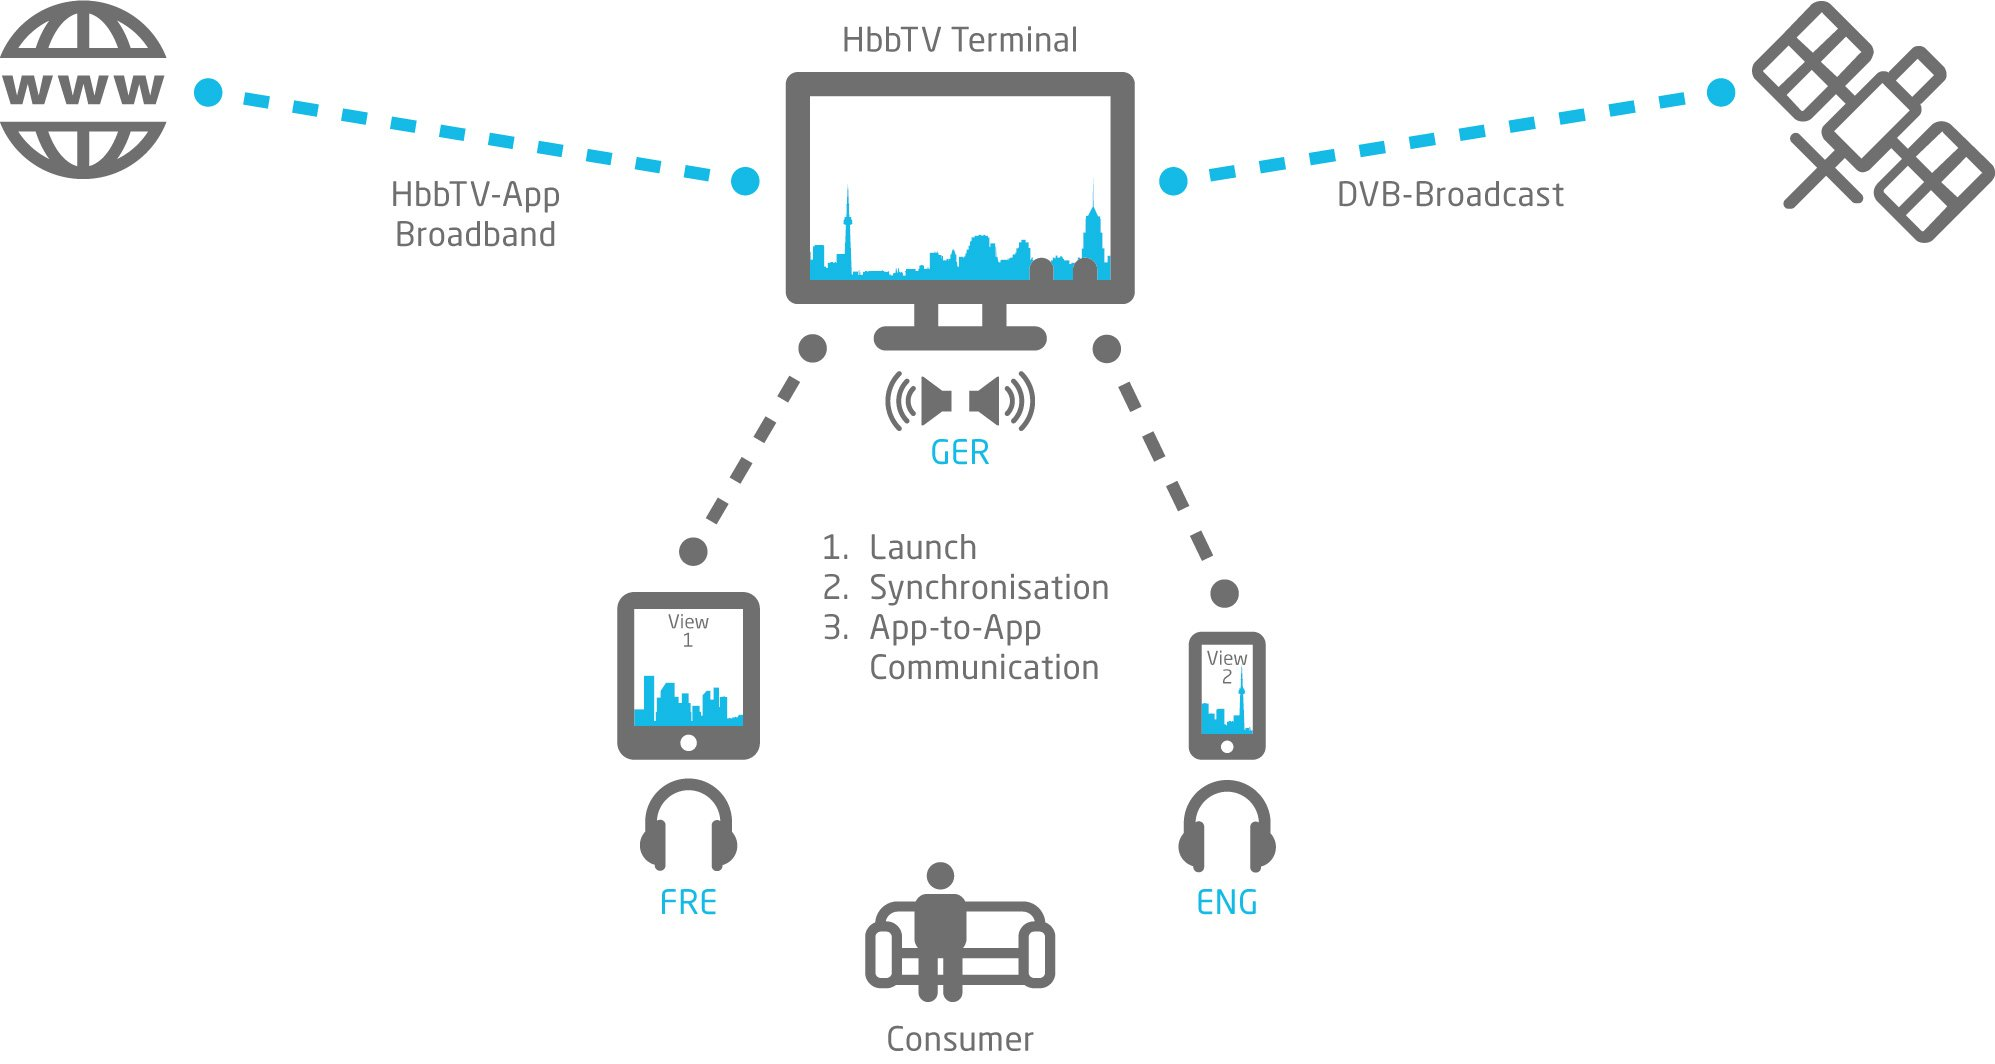 fame grafik produktblatt hbbtv 2.0 companion screen and media synchronization framework